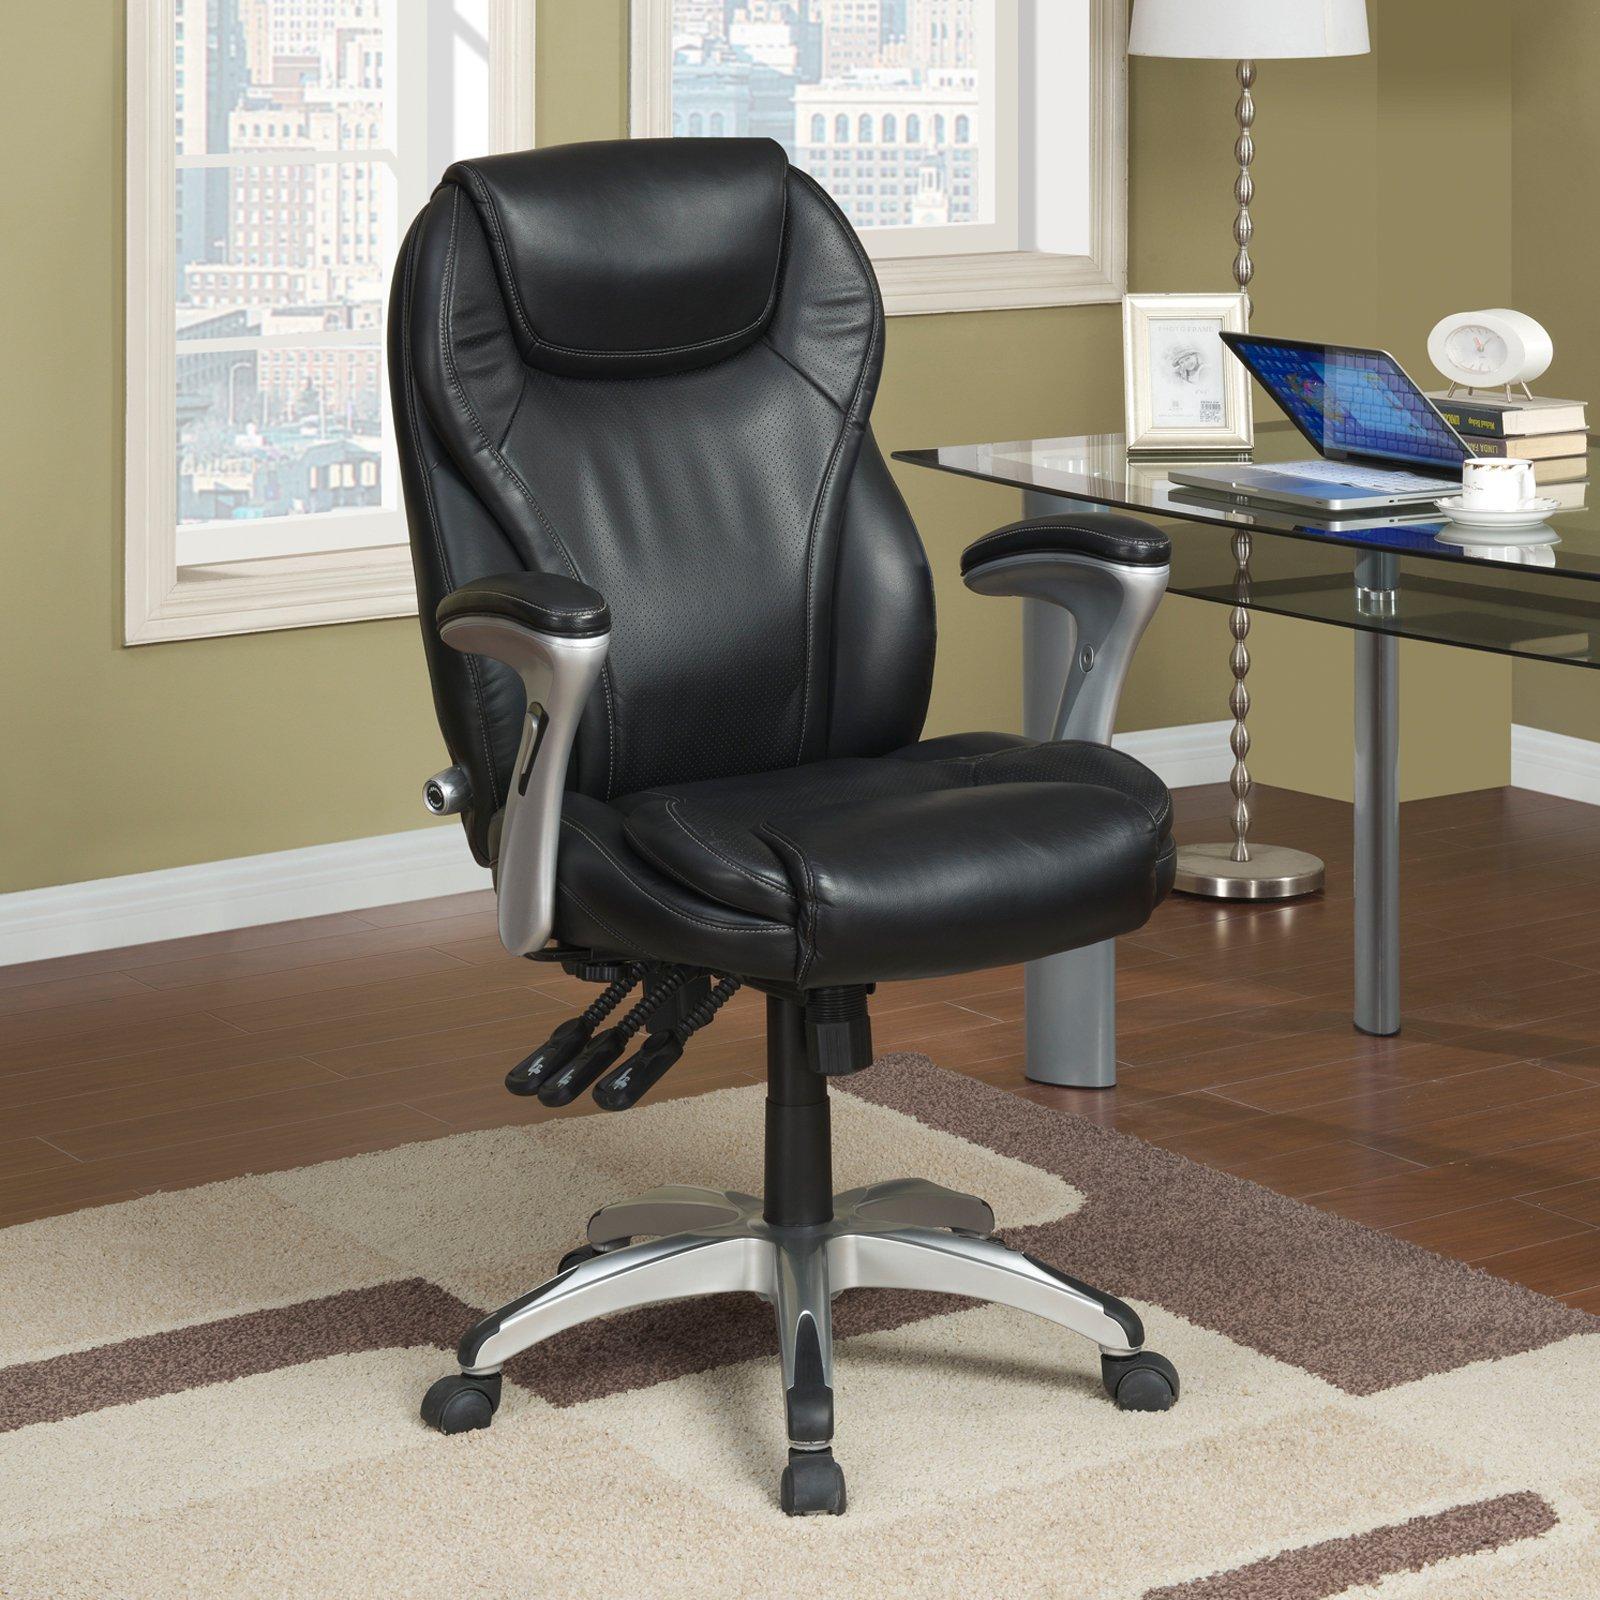 Serta Ergo Executive Office Chair In Black Bonded Leather Walmart Com